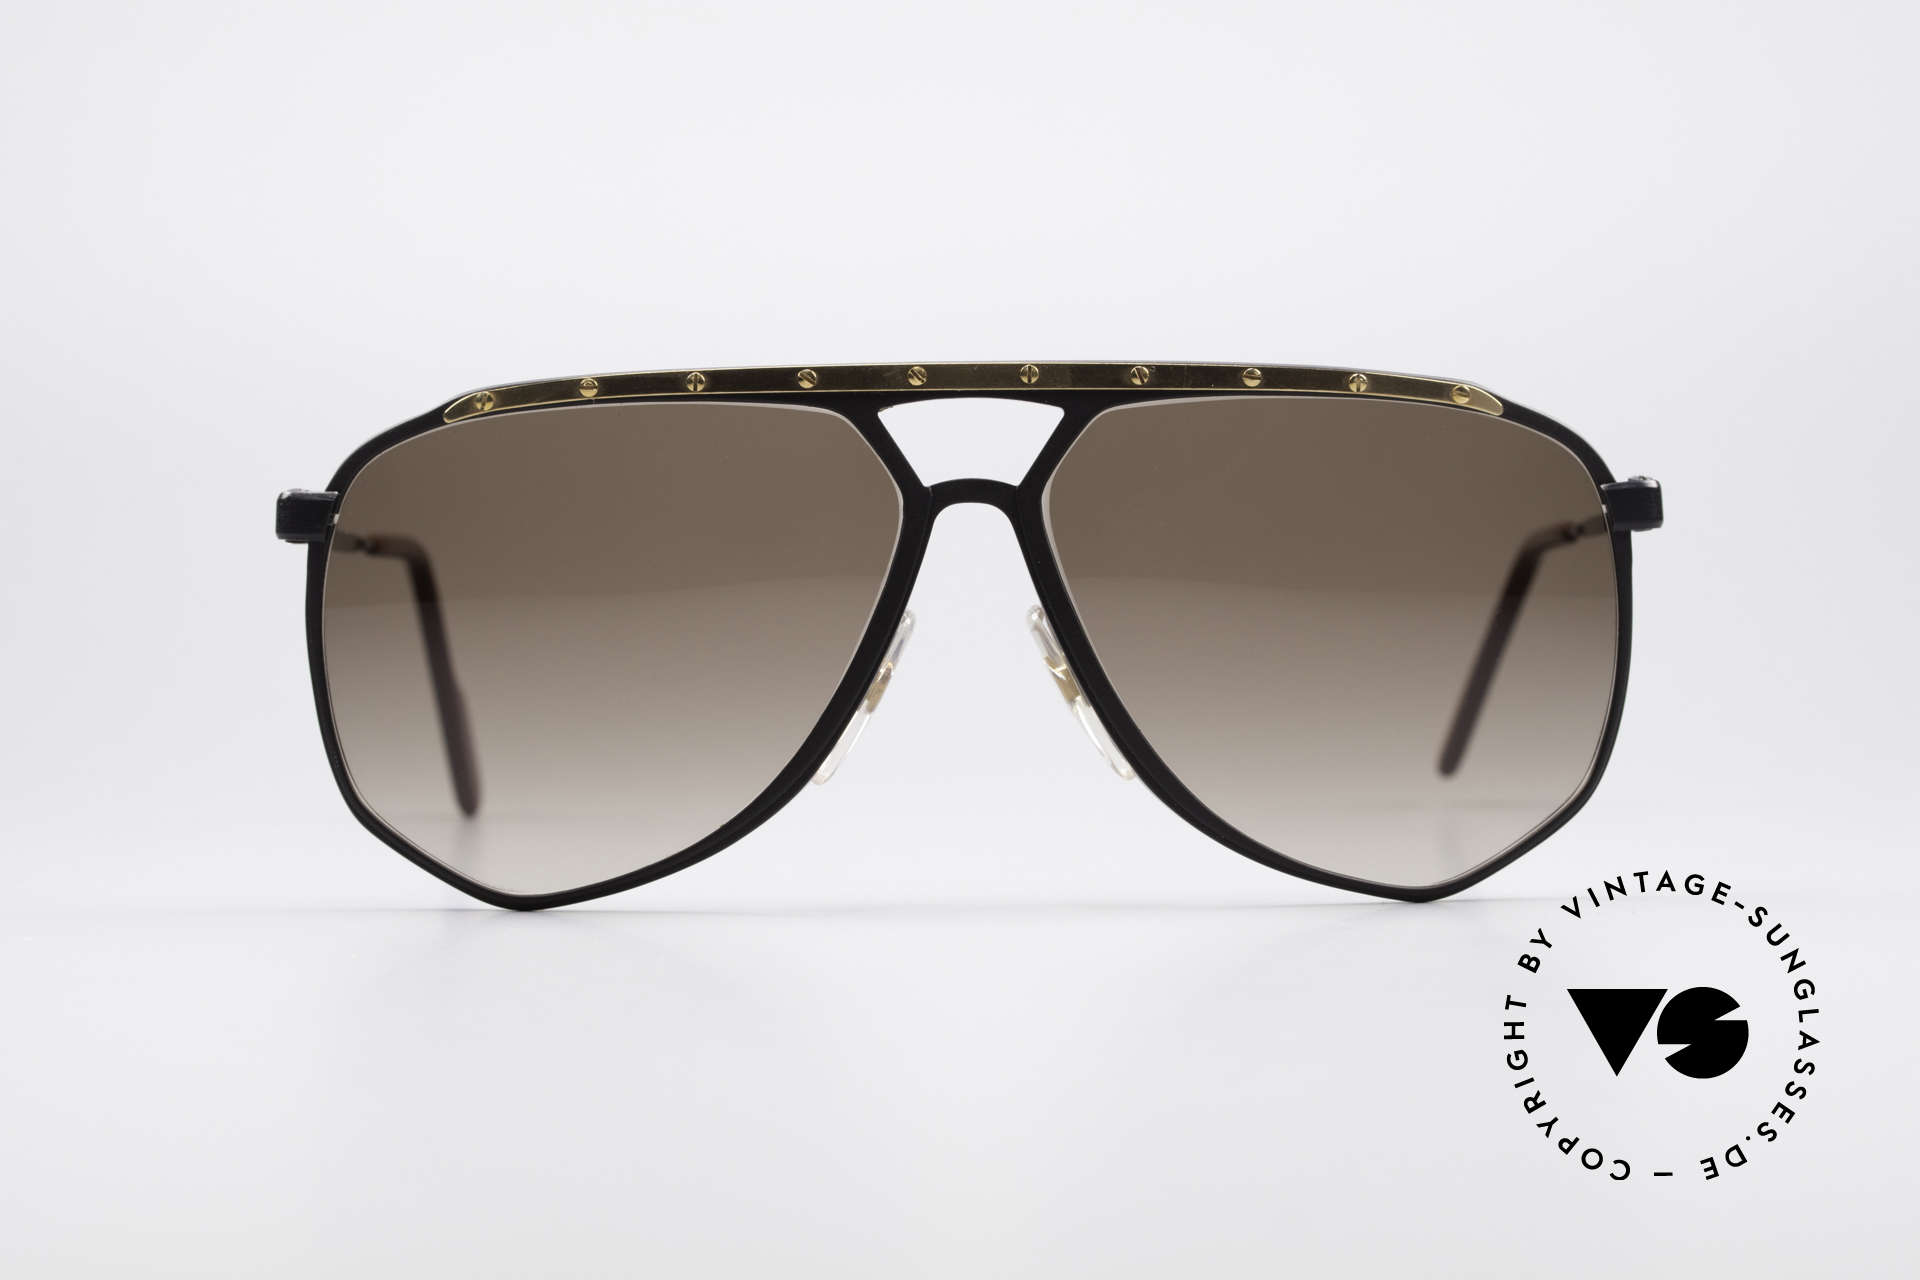 b4cd7360cb Sunglasses Alpina M1 4 Rare Vintage Sunglasses